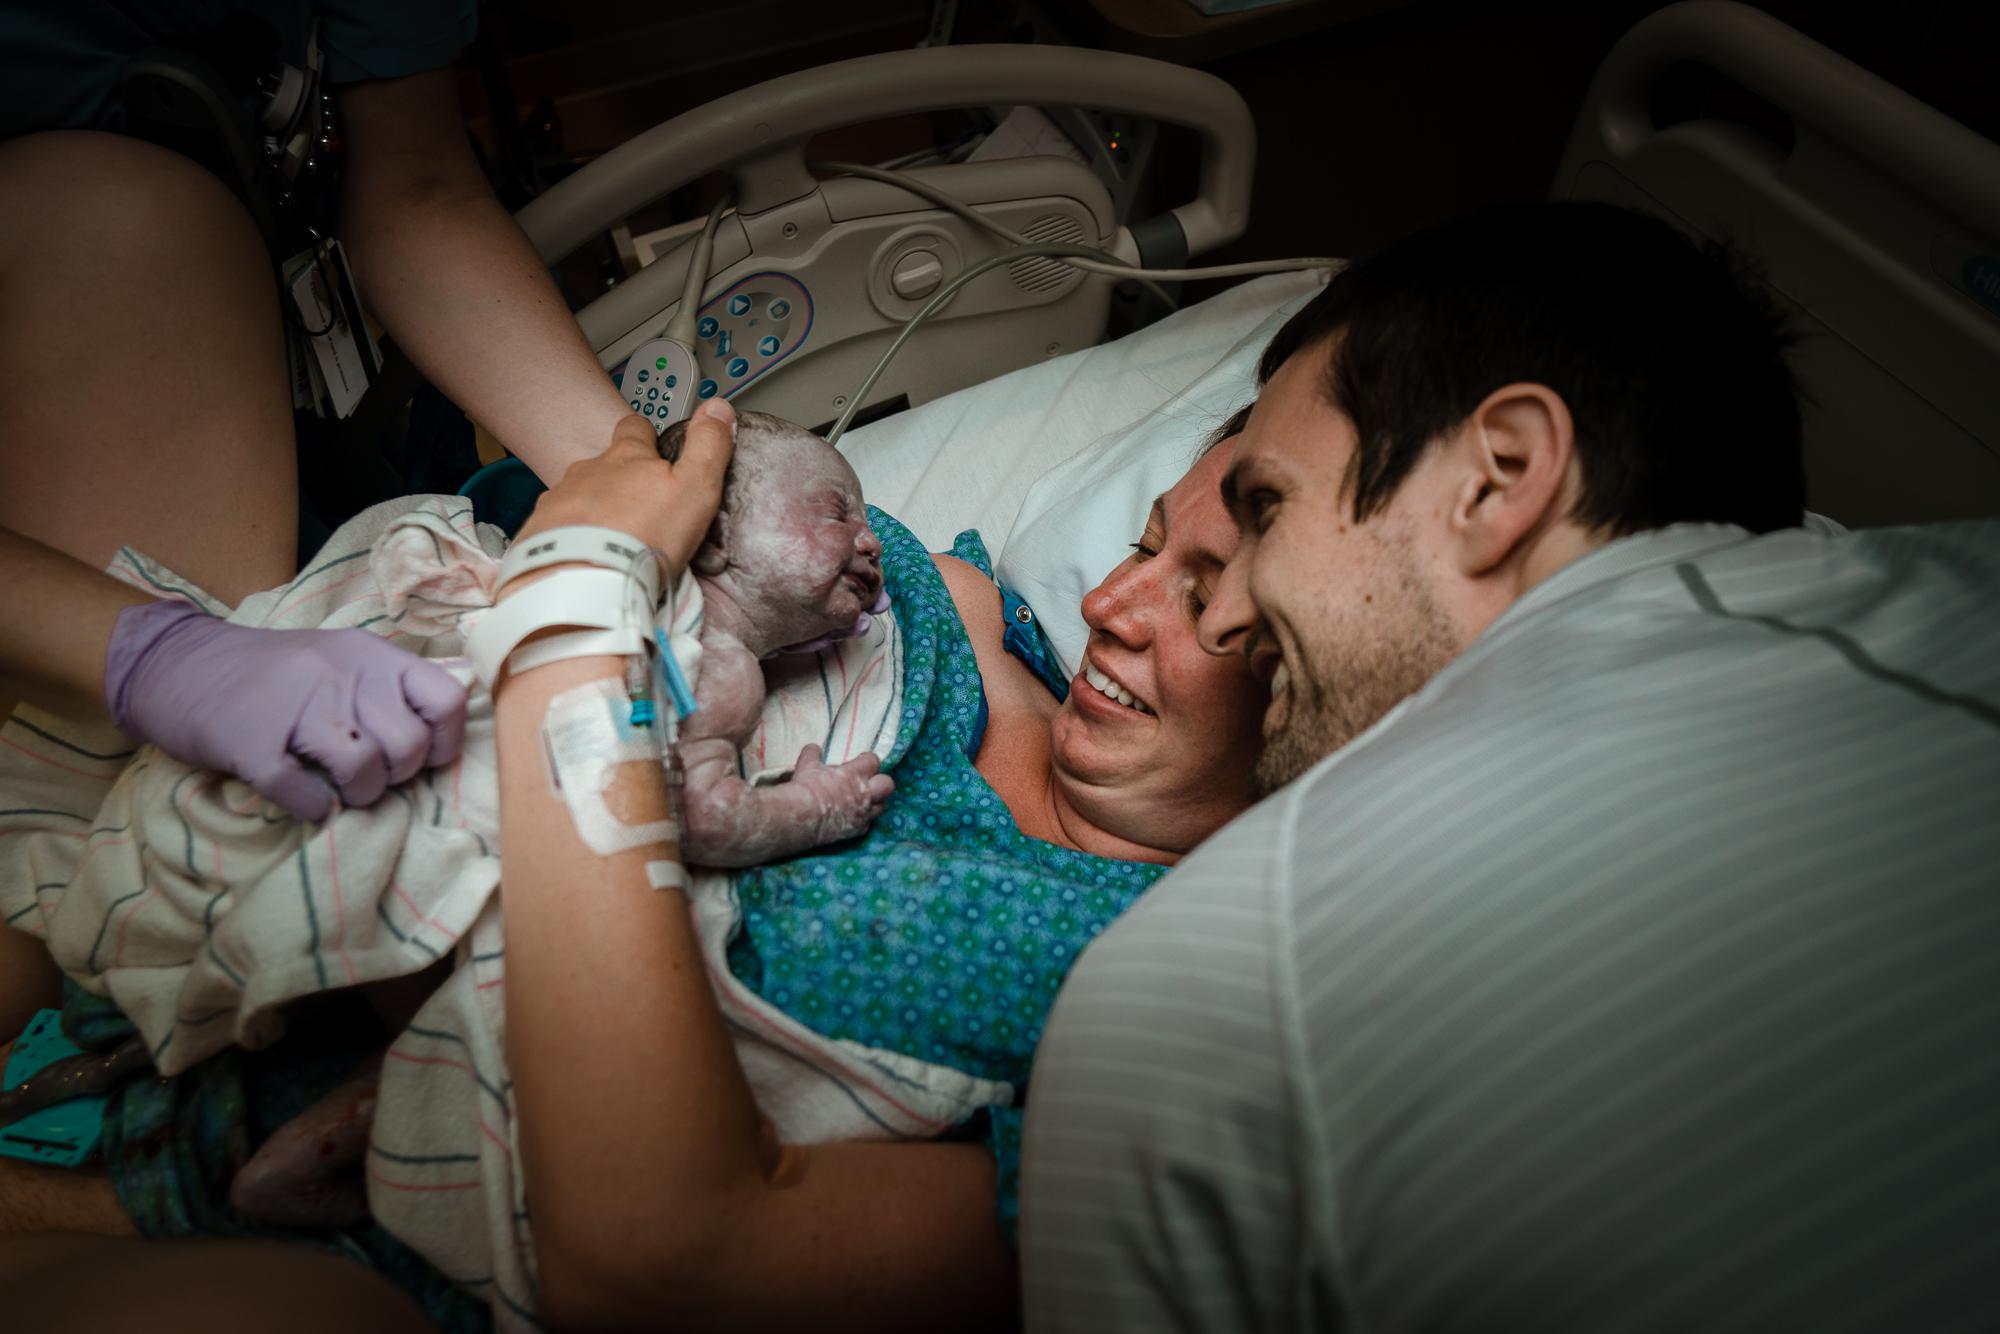 Minnesota Birth Photography by Meredith Westin-June 13, 2019-042348.jpg